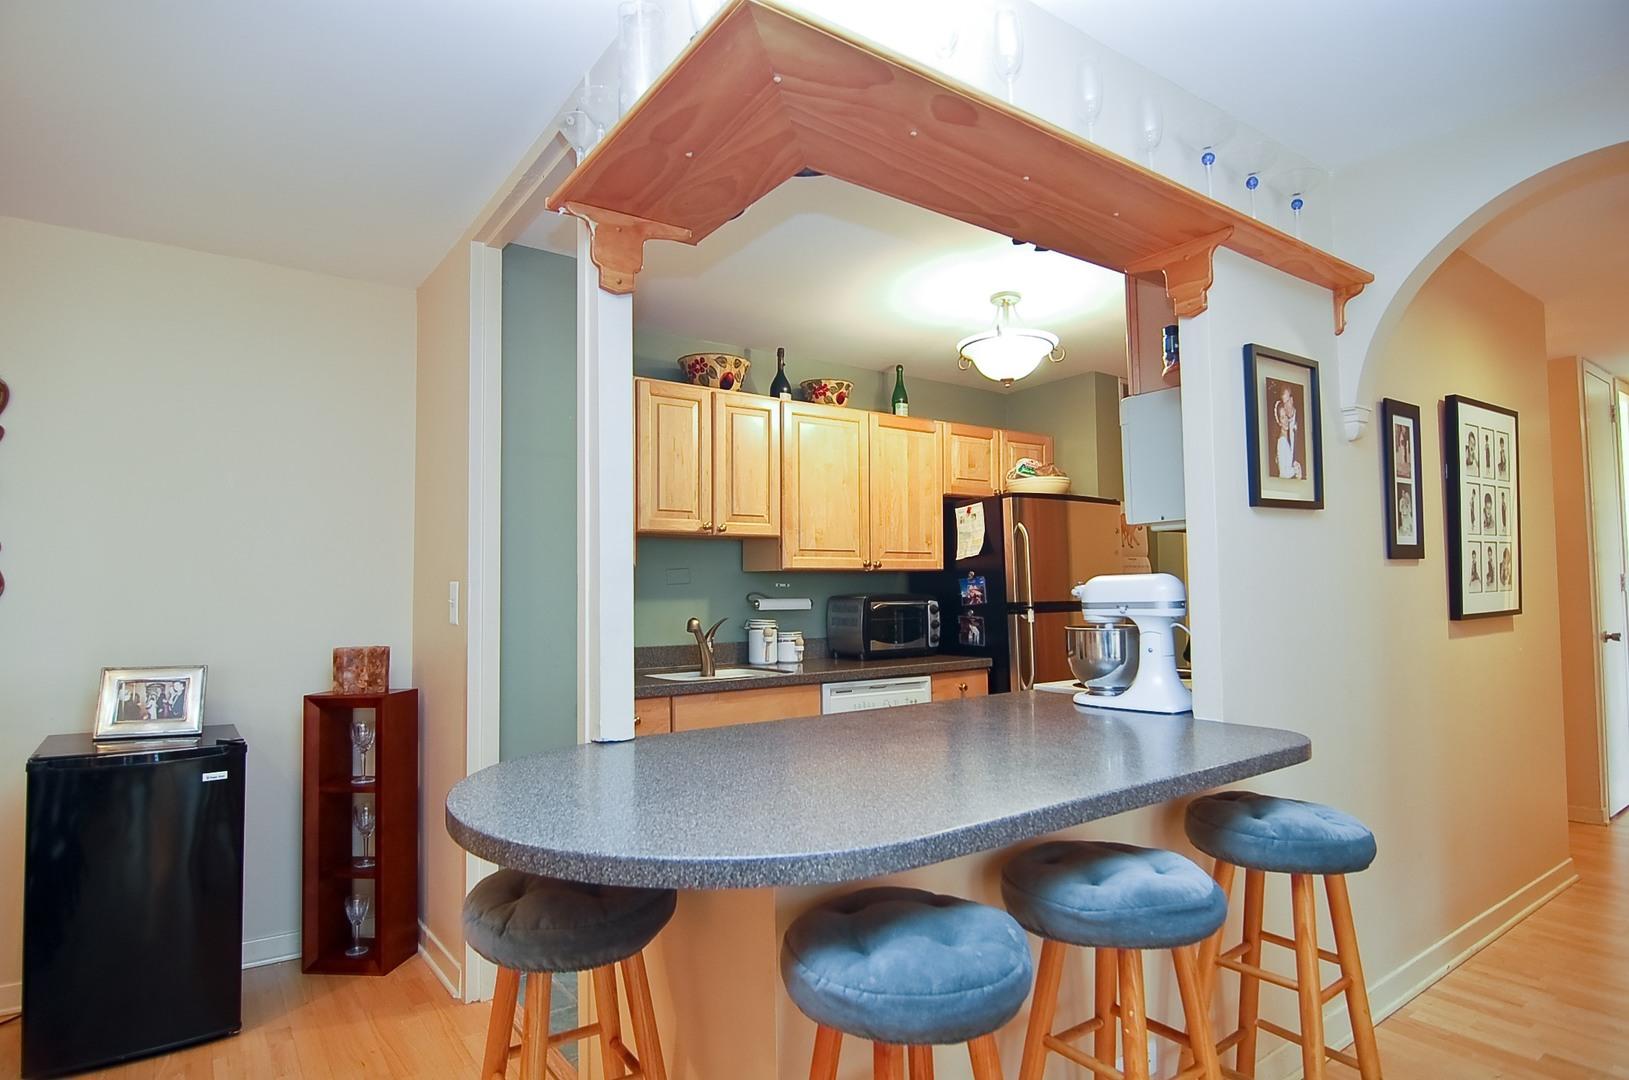 Hd 1497289687574 05 2626nlakeview unit301 177 kitchen hires